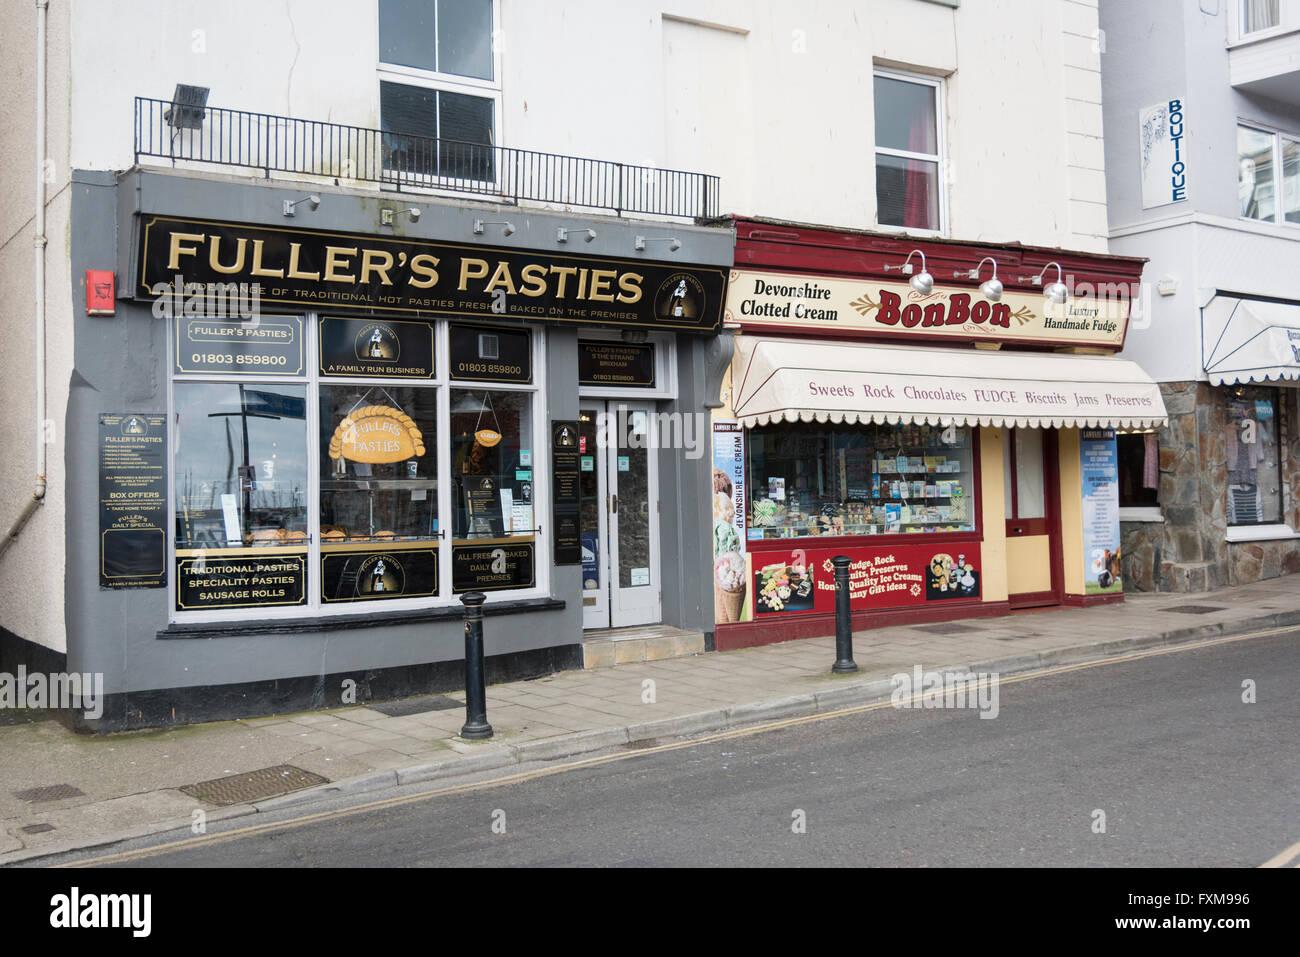 Fullers Pasties and Bon Bon sweet shop in a street in Brixham Devon UK - Stock Image